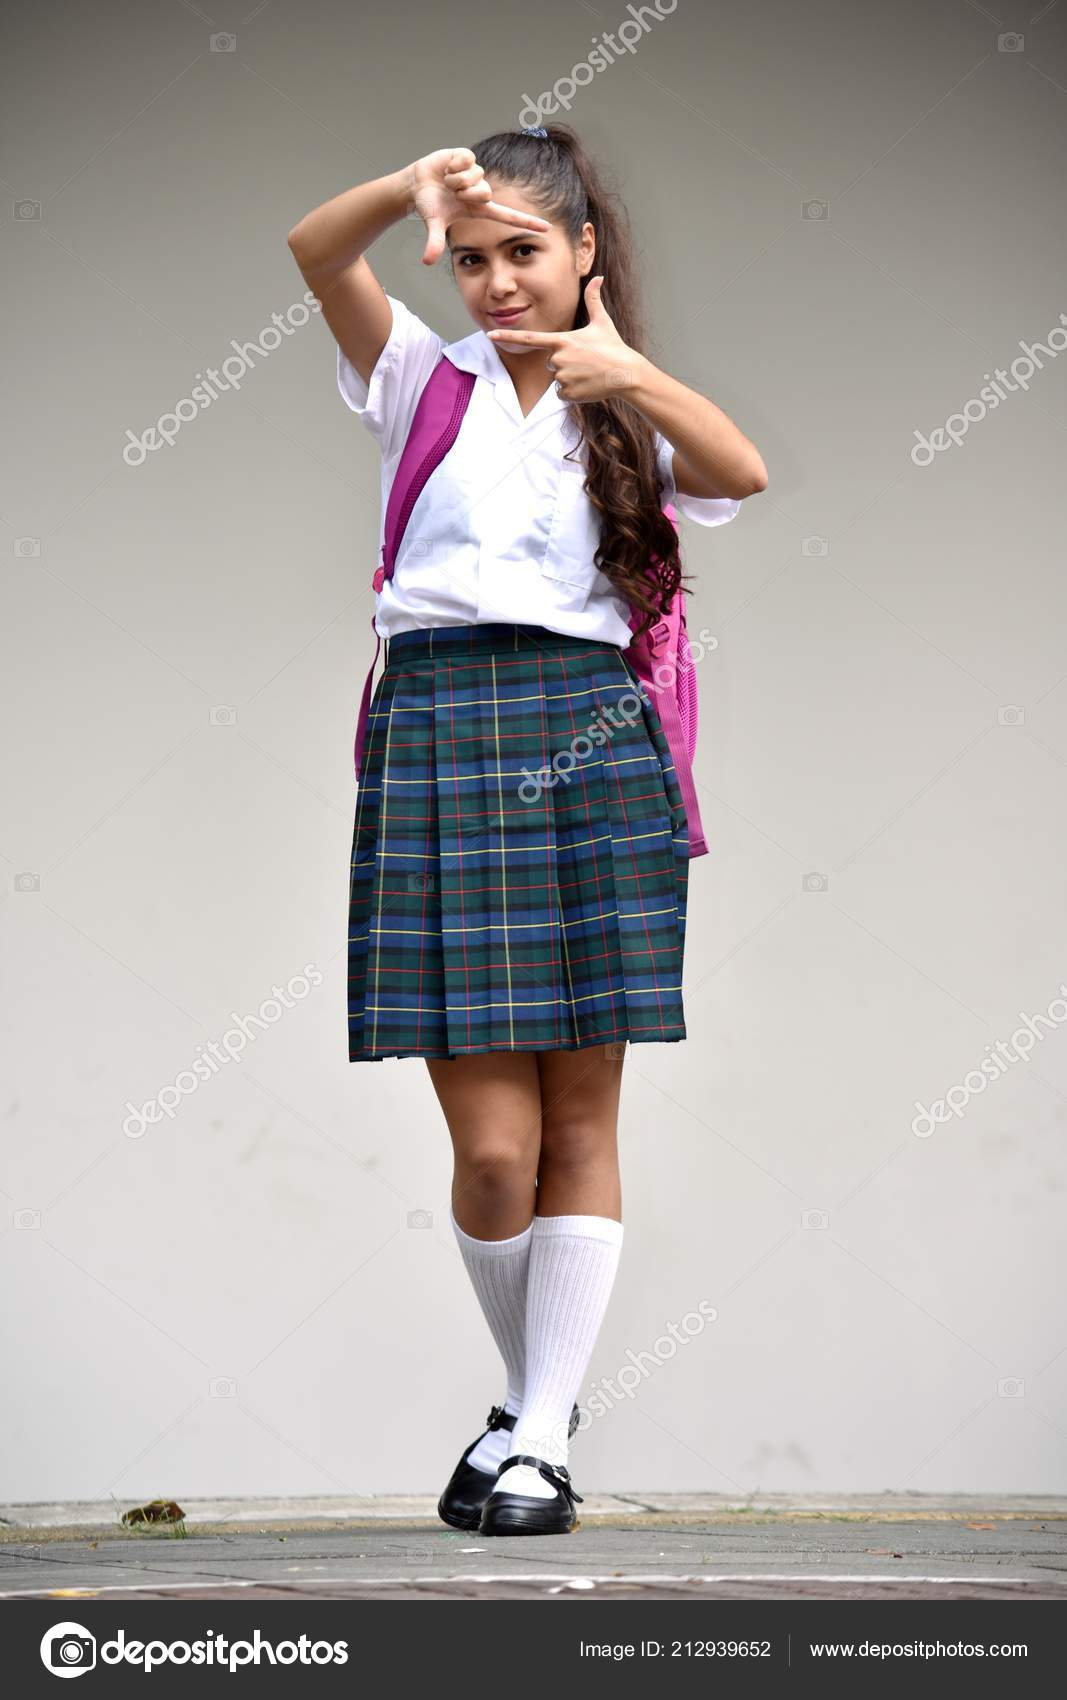 4ec5a836a67 Catholic Student Teenager School Girl Posing Wearing School Uniform– stock  image